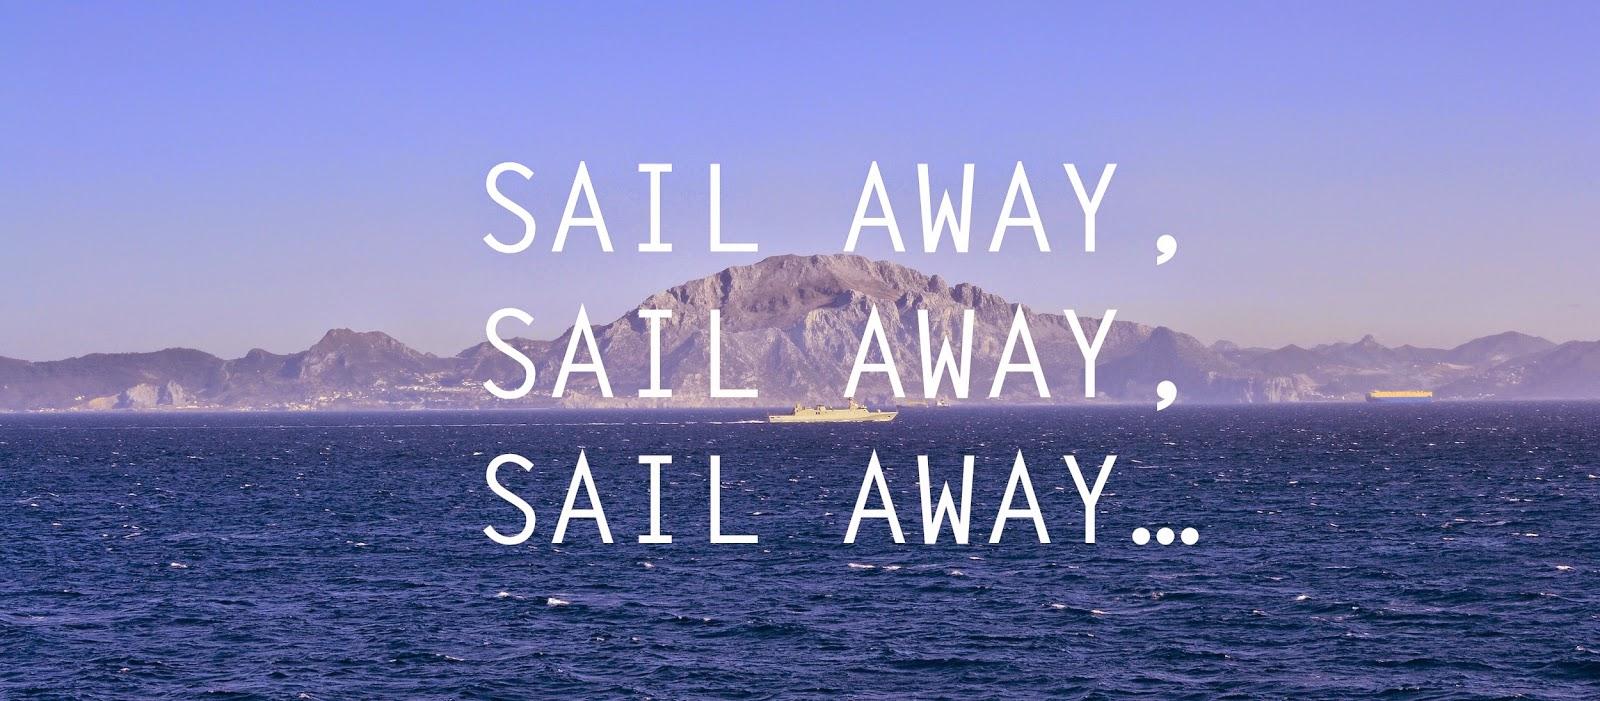 Sail away title image